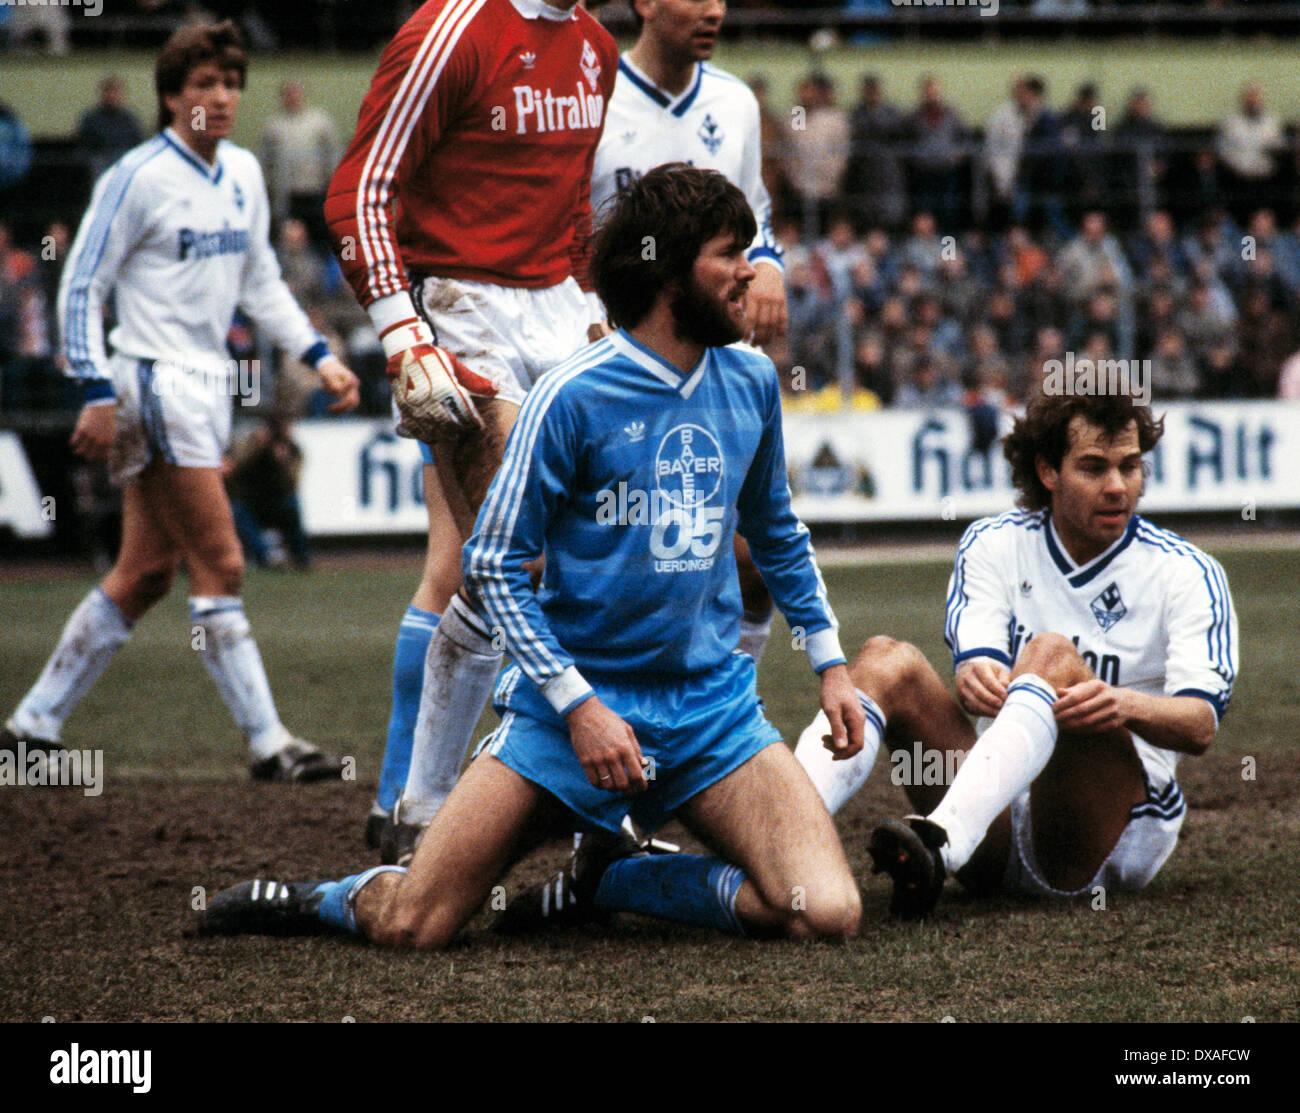 football, Bundesliga, 1984/1985, Grotenburg Stadium, FC Bayer 05 Uerdingen versus SV Waldhof Mannheim 2:2, scene of the match, Dieter Schlindwein (SVW) right and Friedhelm Funkel (Bayer) aground - Stock Image